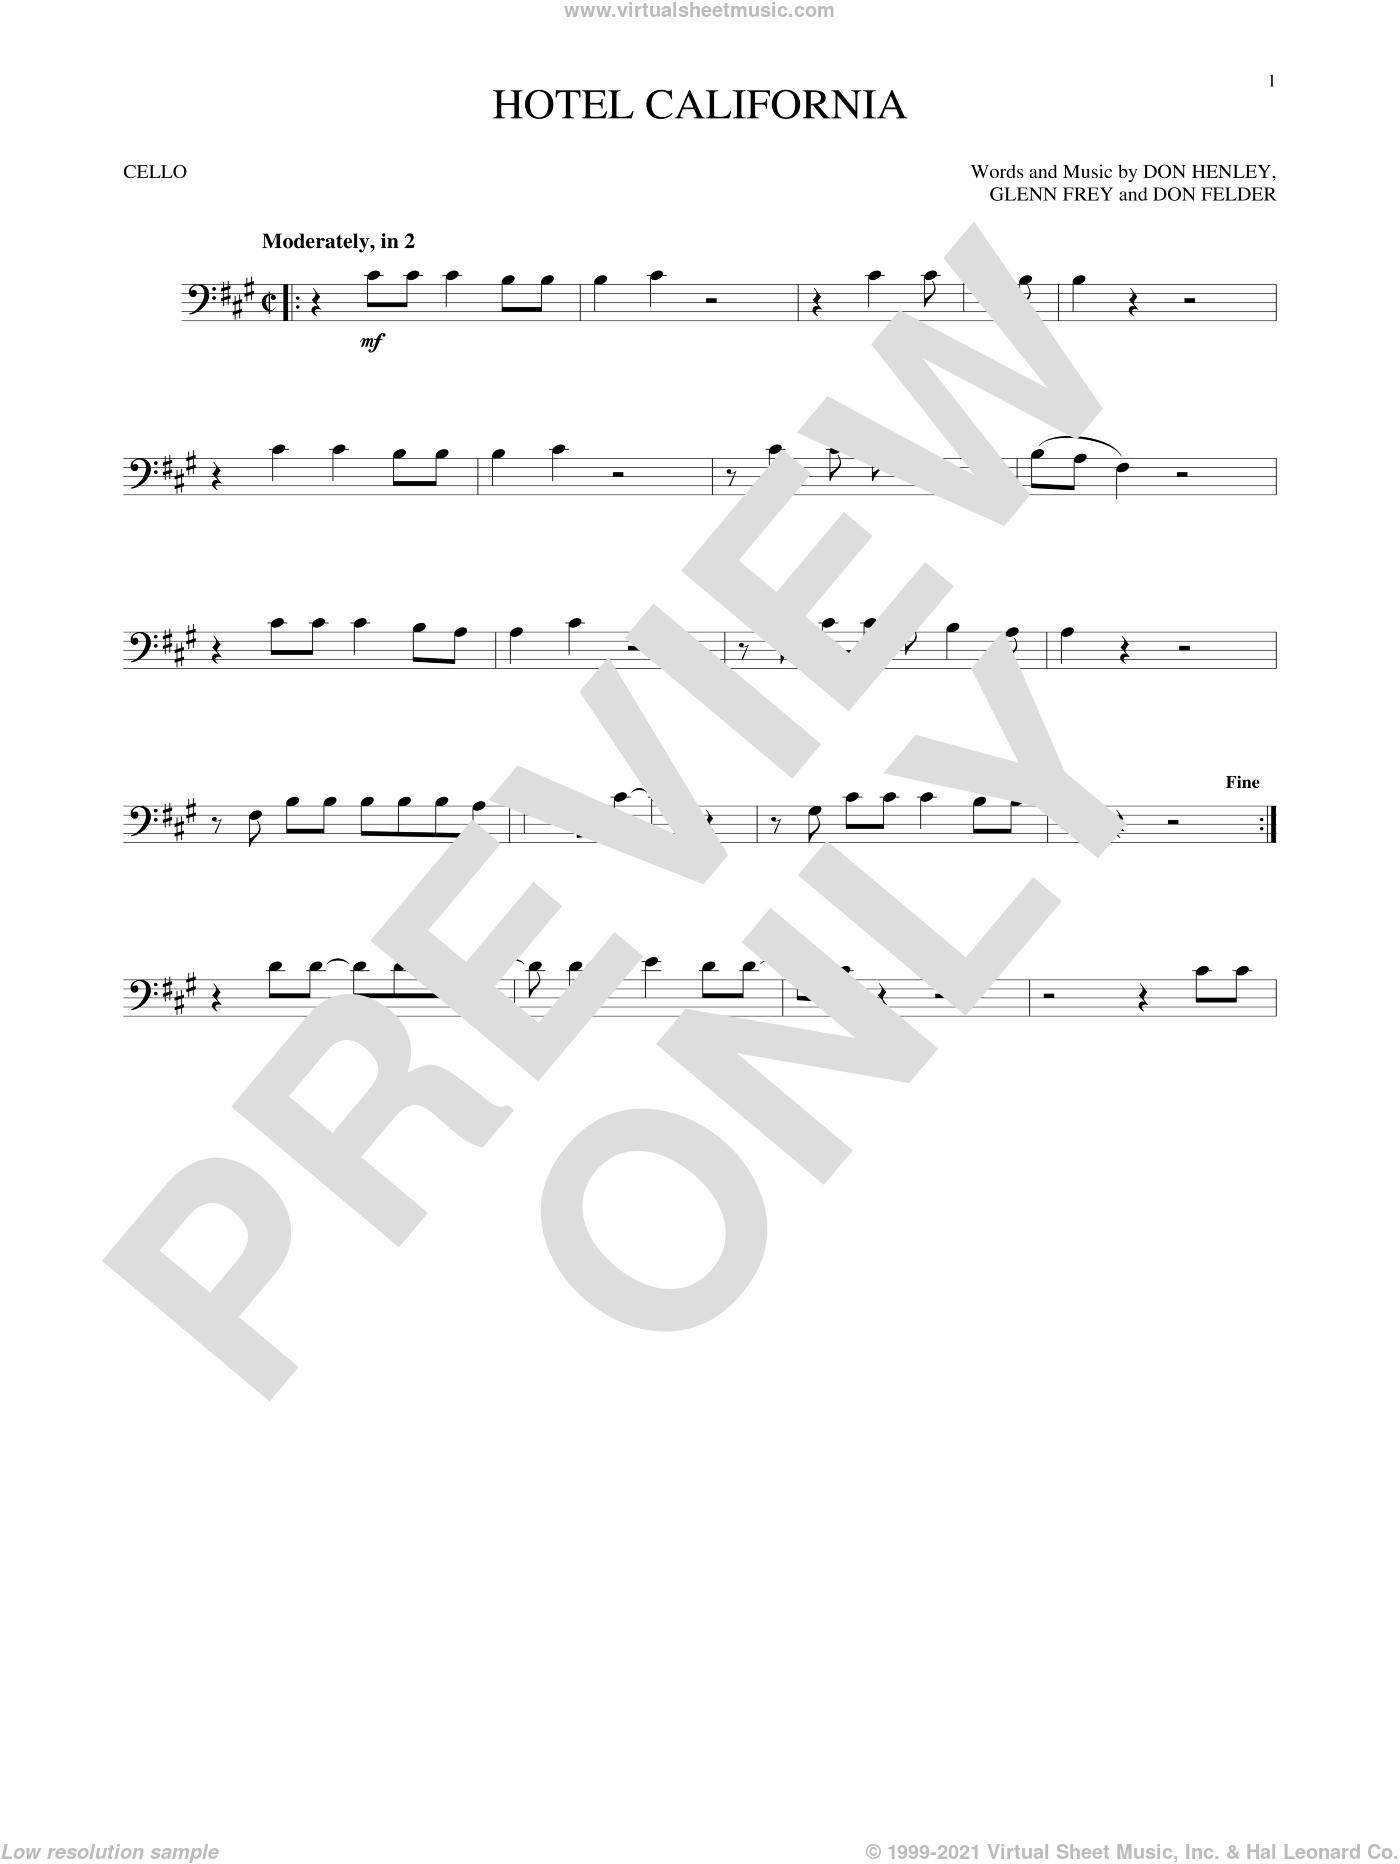 Hotel California sheet music for cello solo by Don Henley, The Eagles, Don Felder and Glenn Frey, intermediate skill level